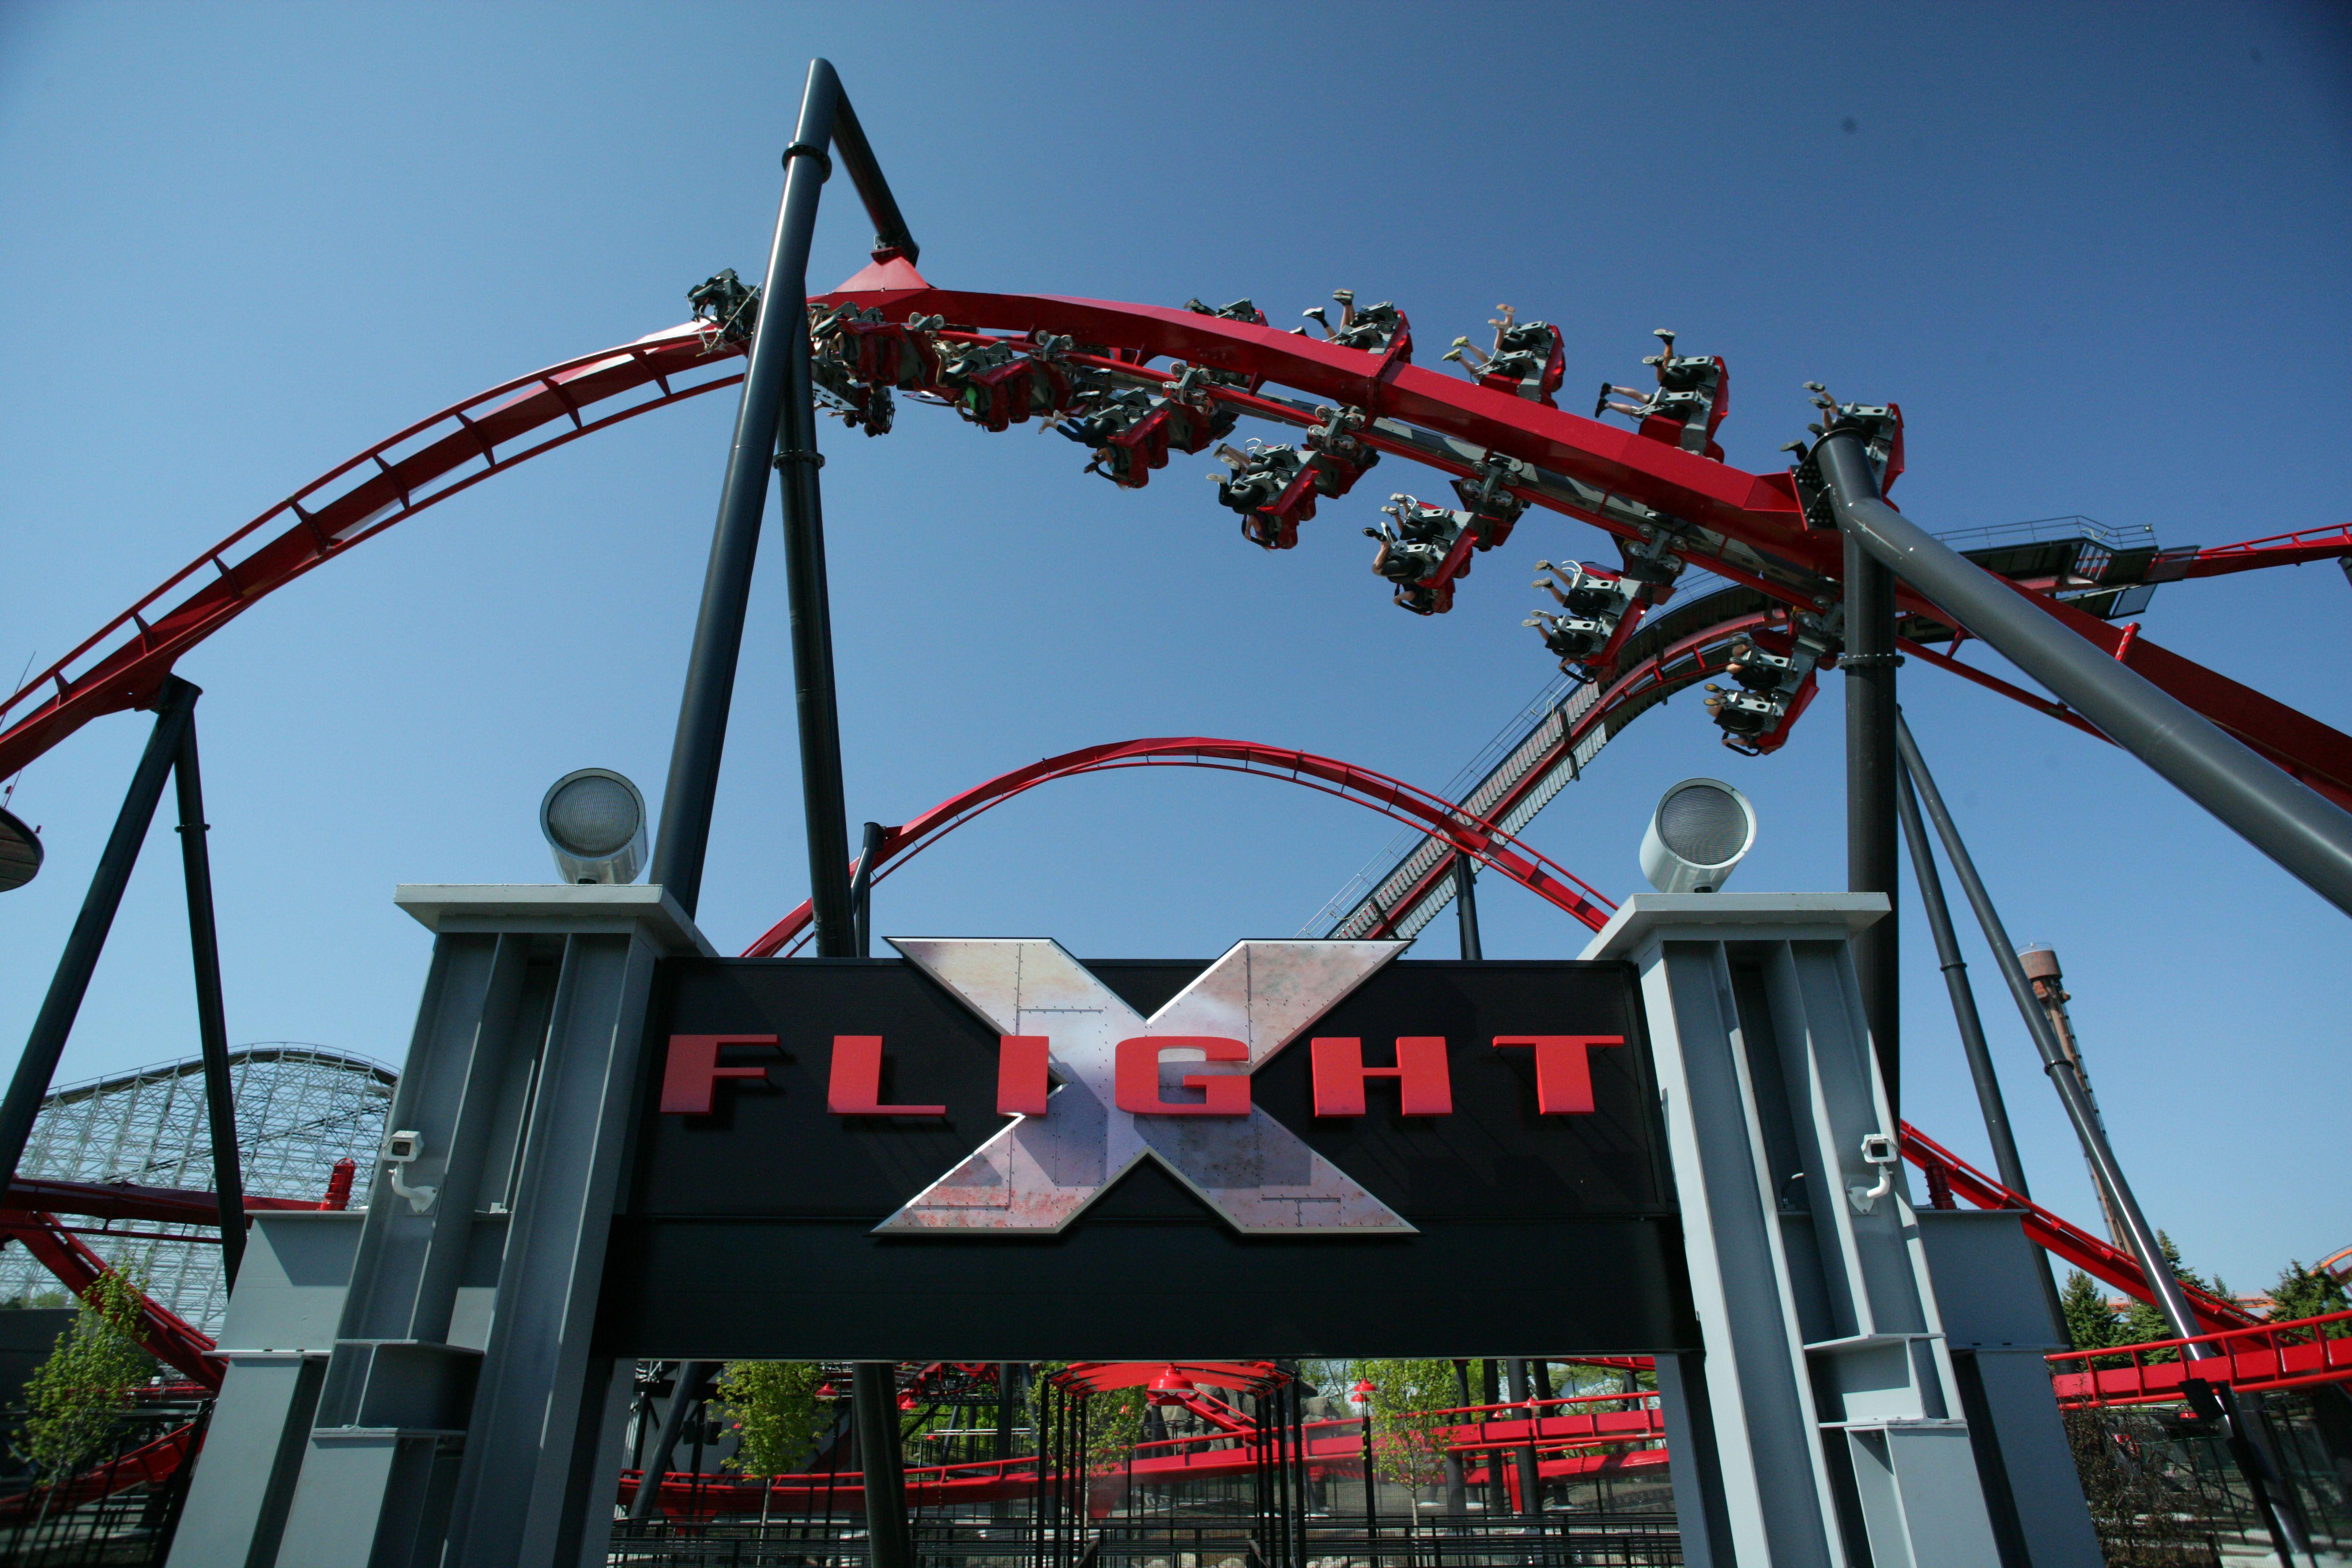 X Flight Great America Best Roller Coasters Roller Coaster Ride